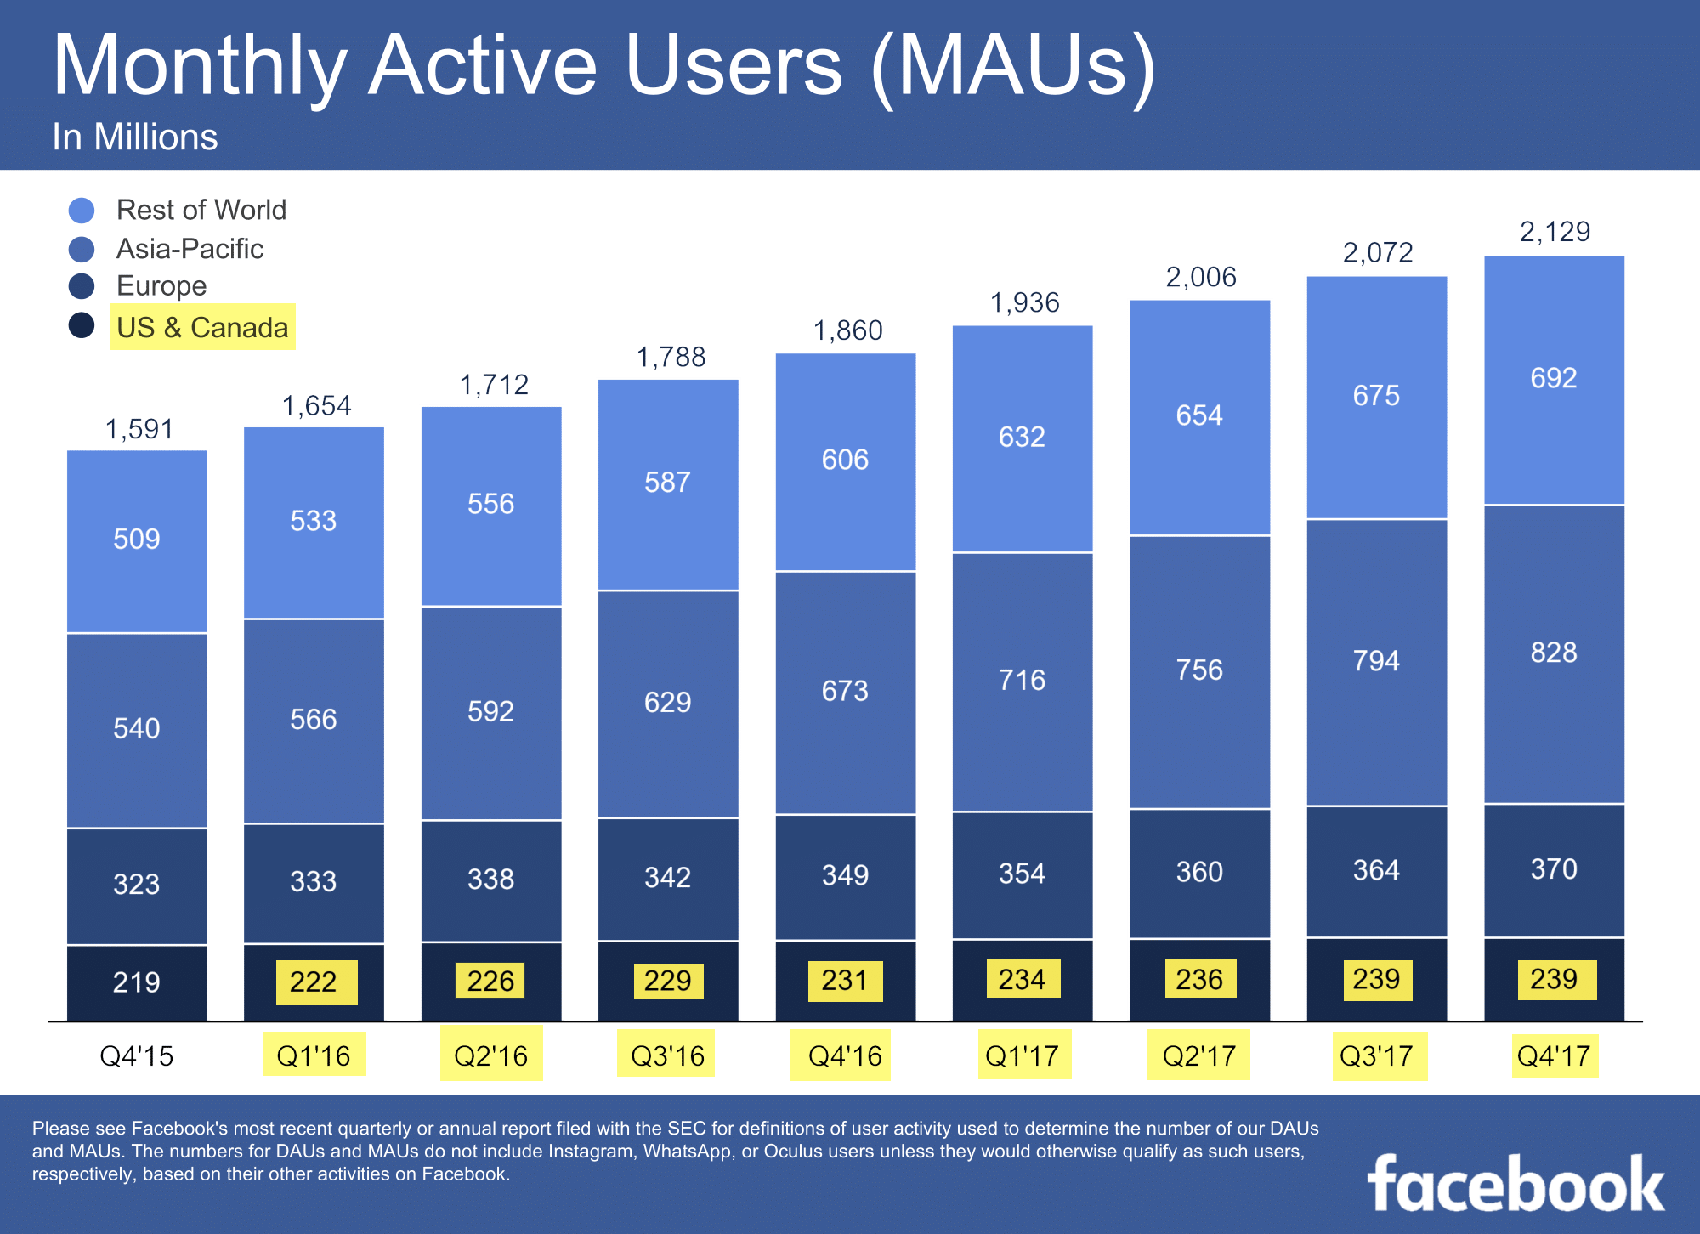 Страница 3 презентации Фейсбука по итогам 2017 года